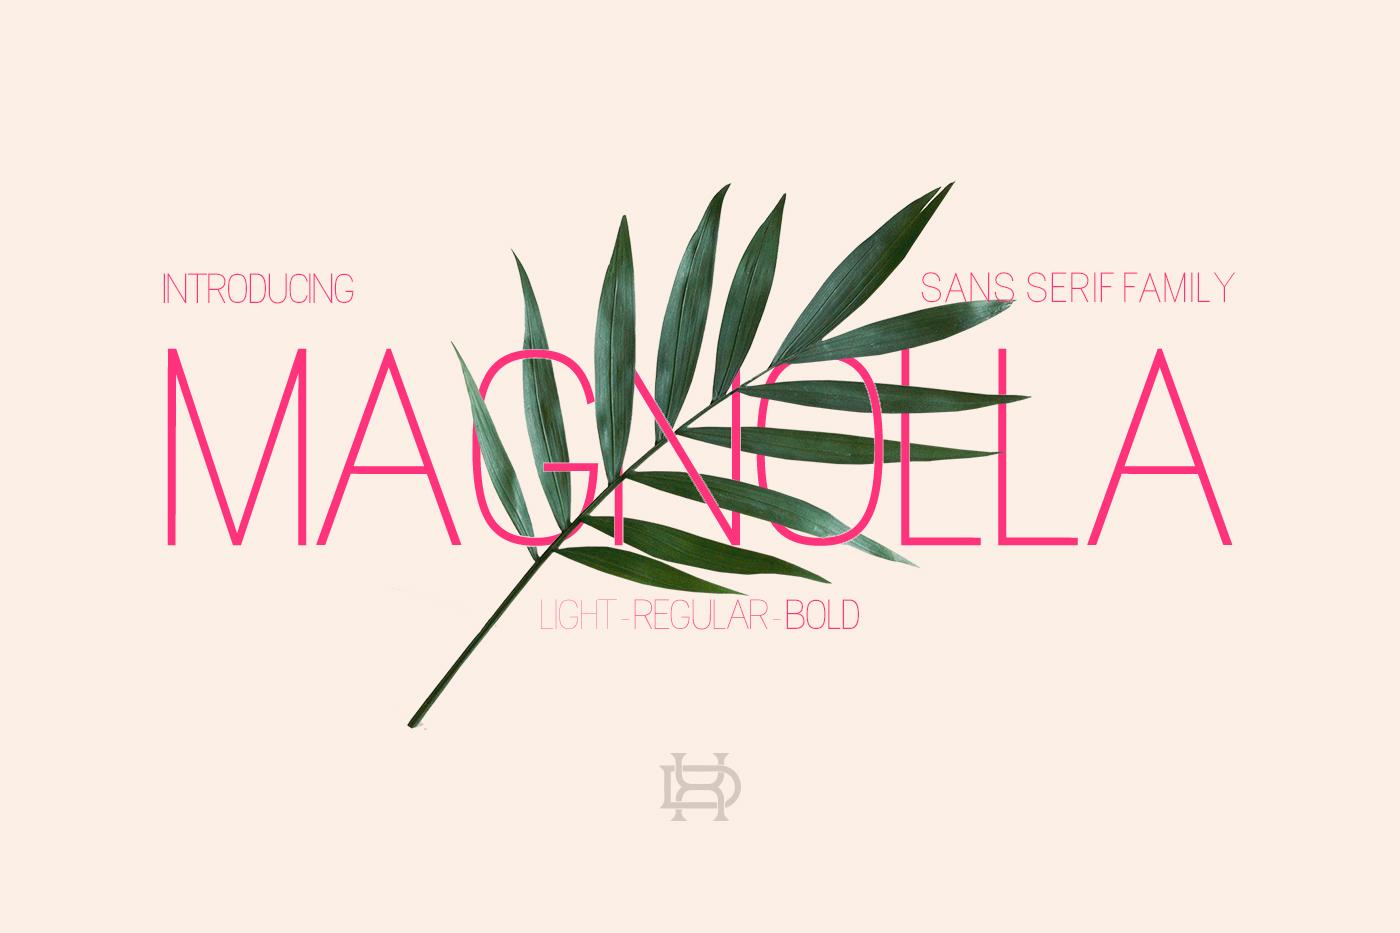 Magnolla_01